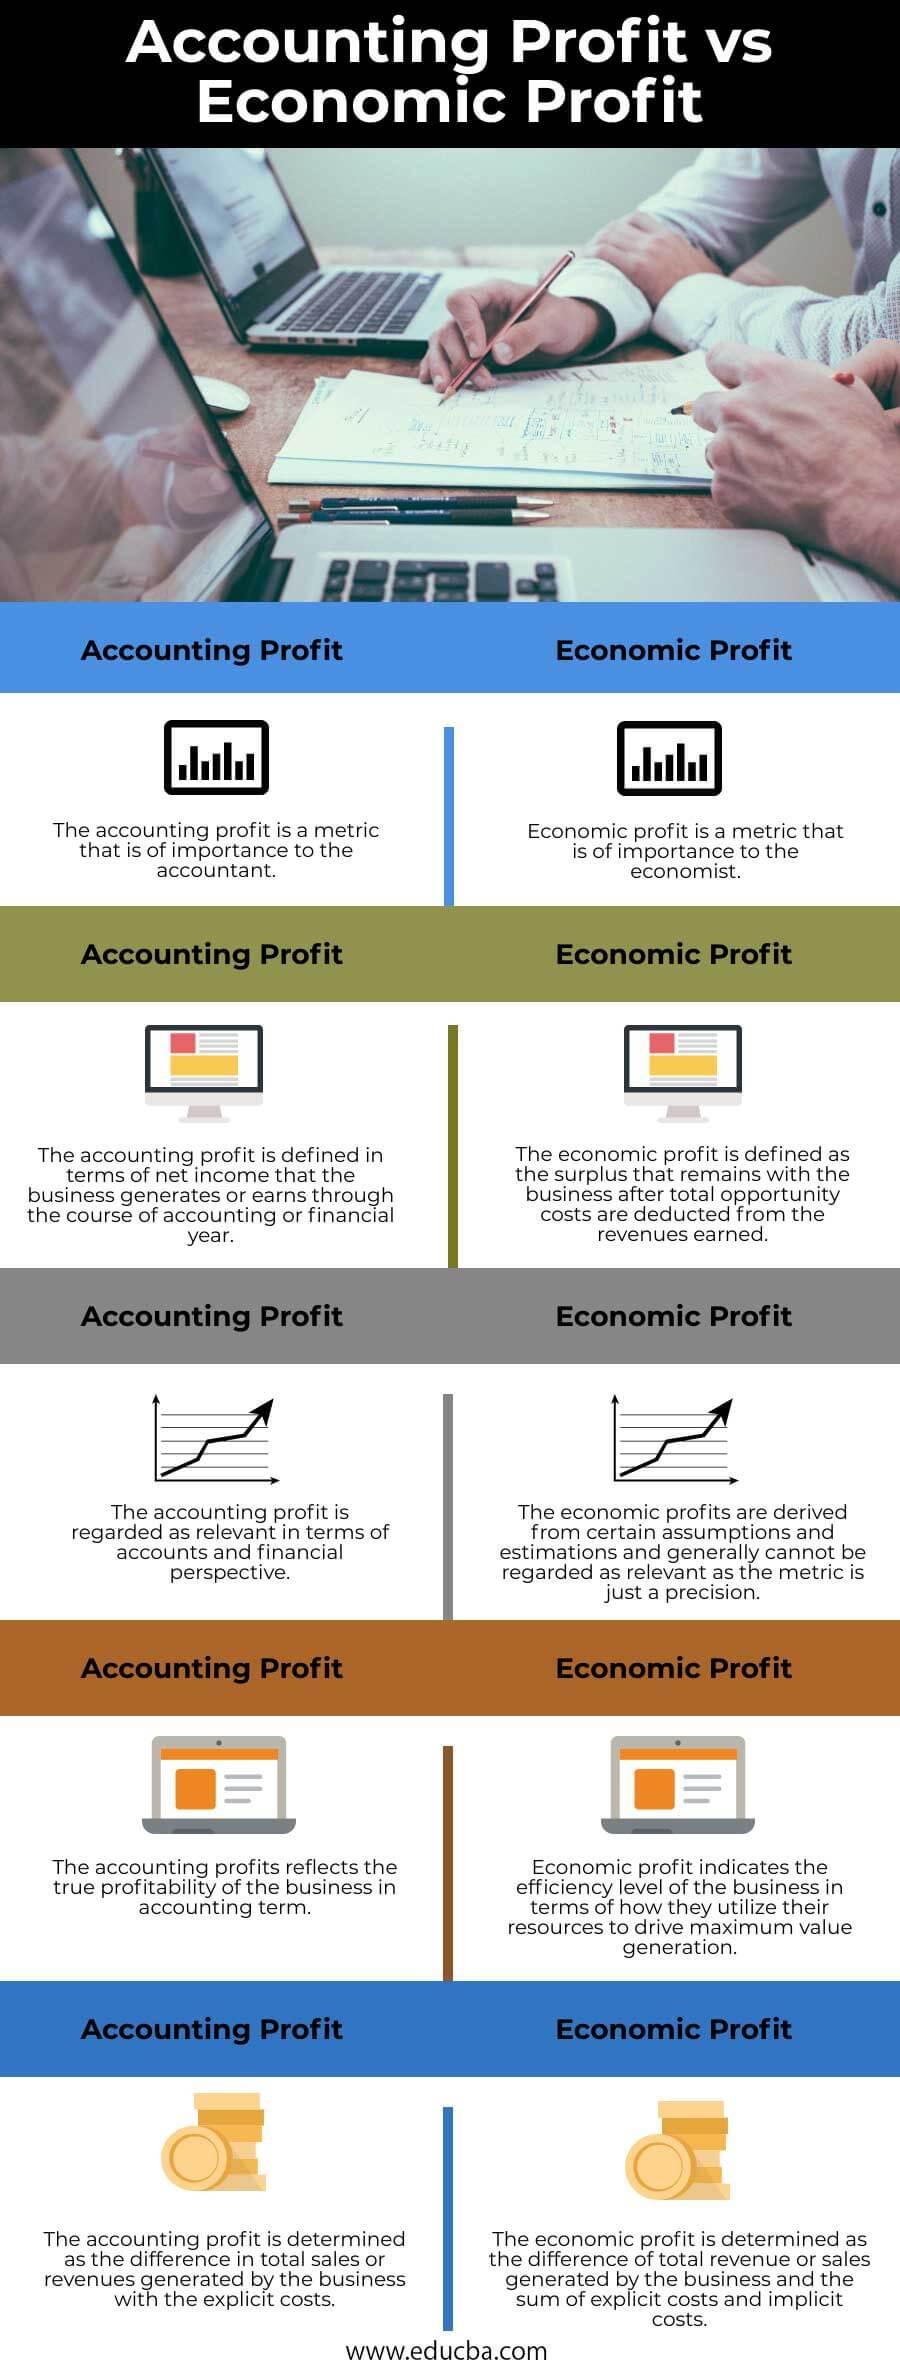 Accounting-Profit-vs-Economic-Profit-info